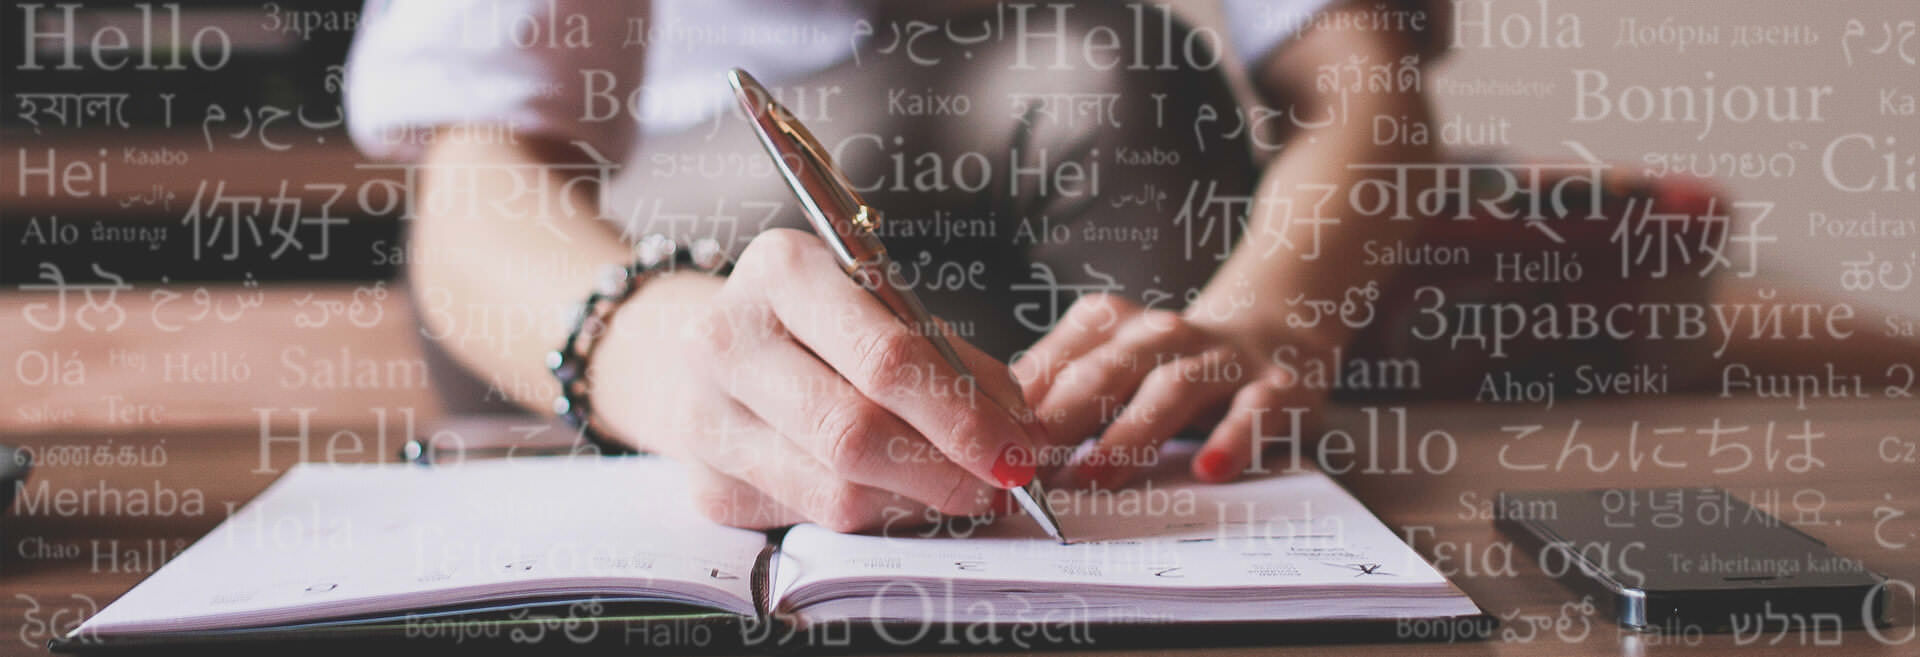 traduceri-legalizate